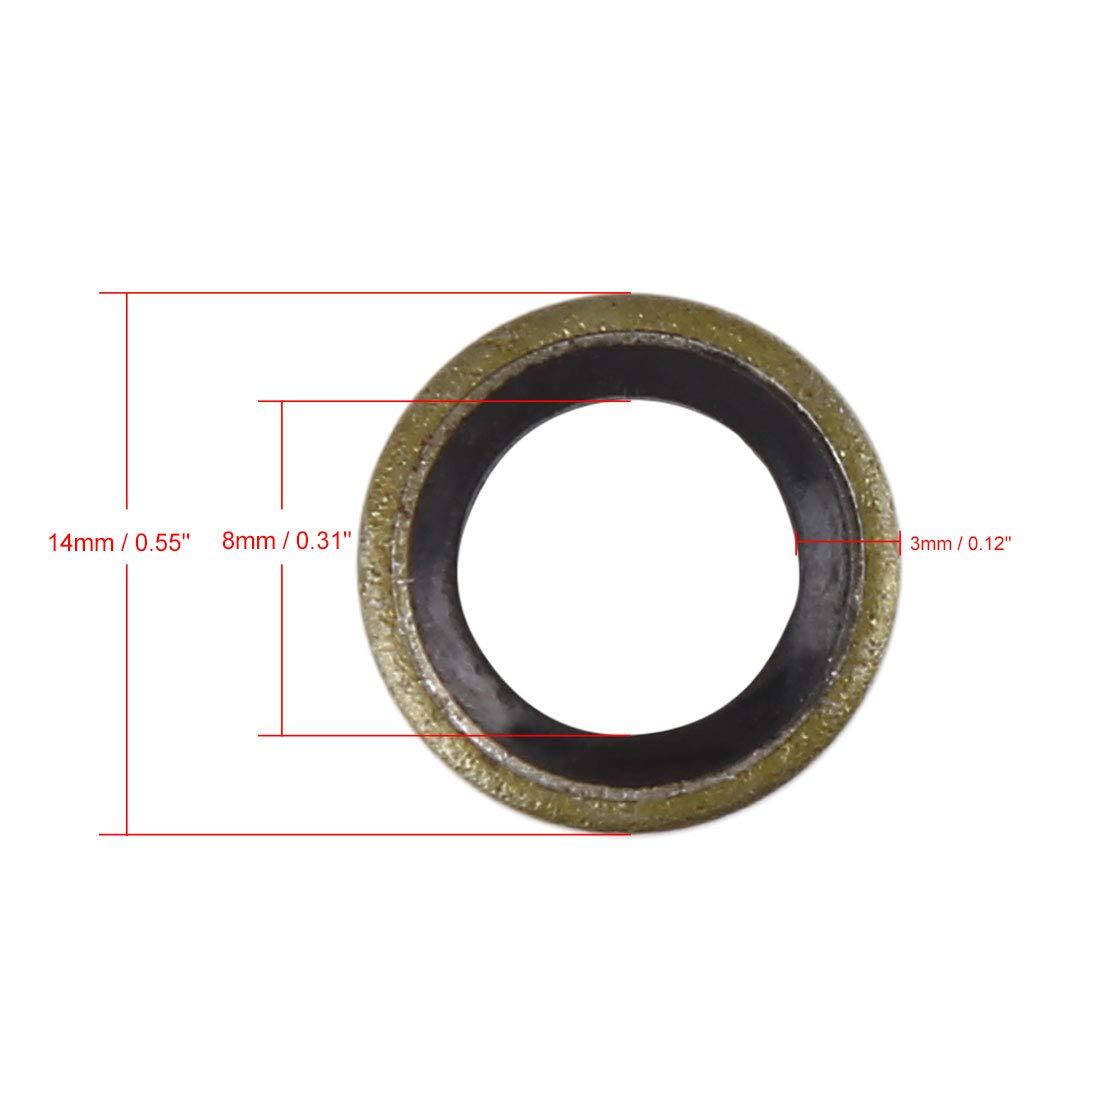 X AUTOHAUX 25pcs M26 Bronze Tone Car Engine Oil Drain Crush Flat Bonded Washer Gaskets